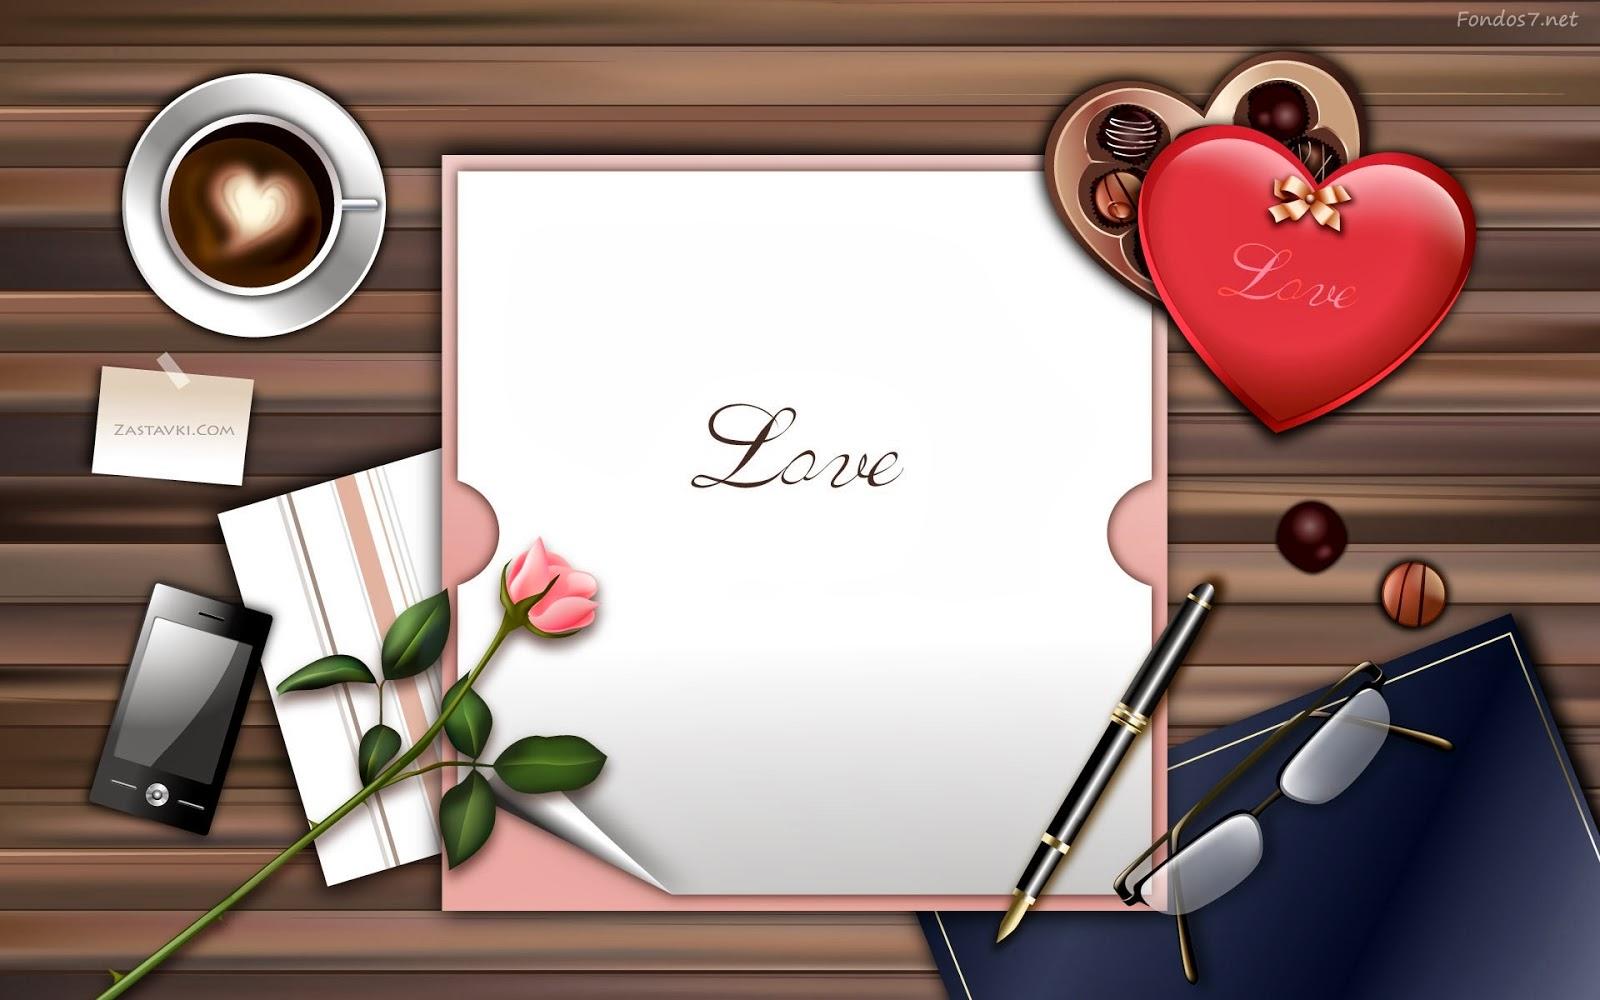 Tarjetas animadas gratis de amor. Frases y mensajes  - Tarjetas De Amor Para Editar